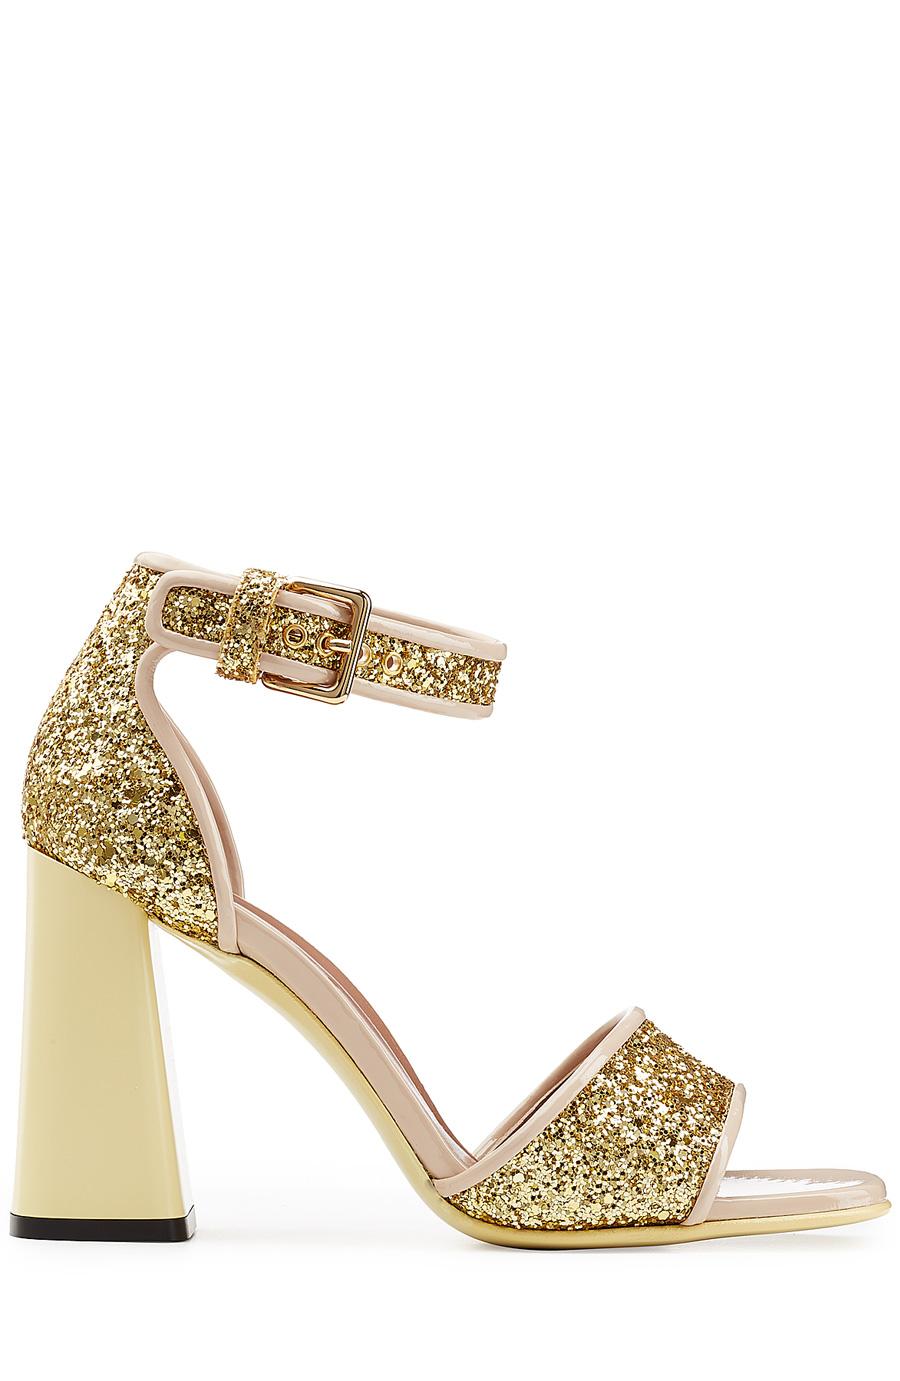 Marni Glitter High Heel Sandals In Gold